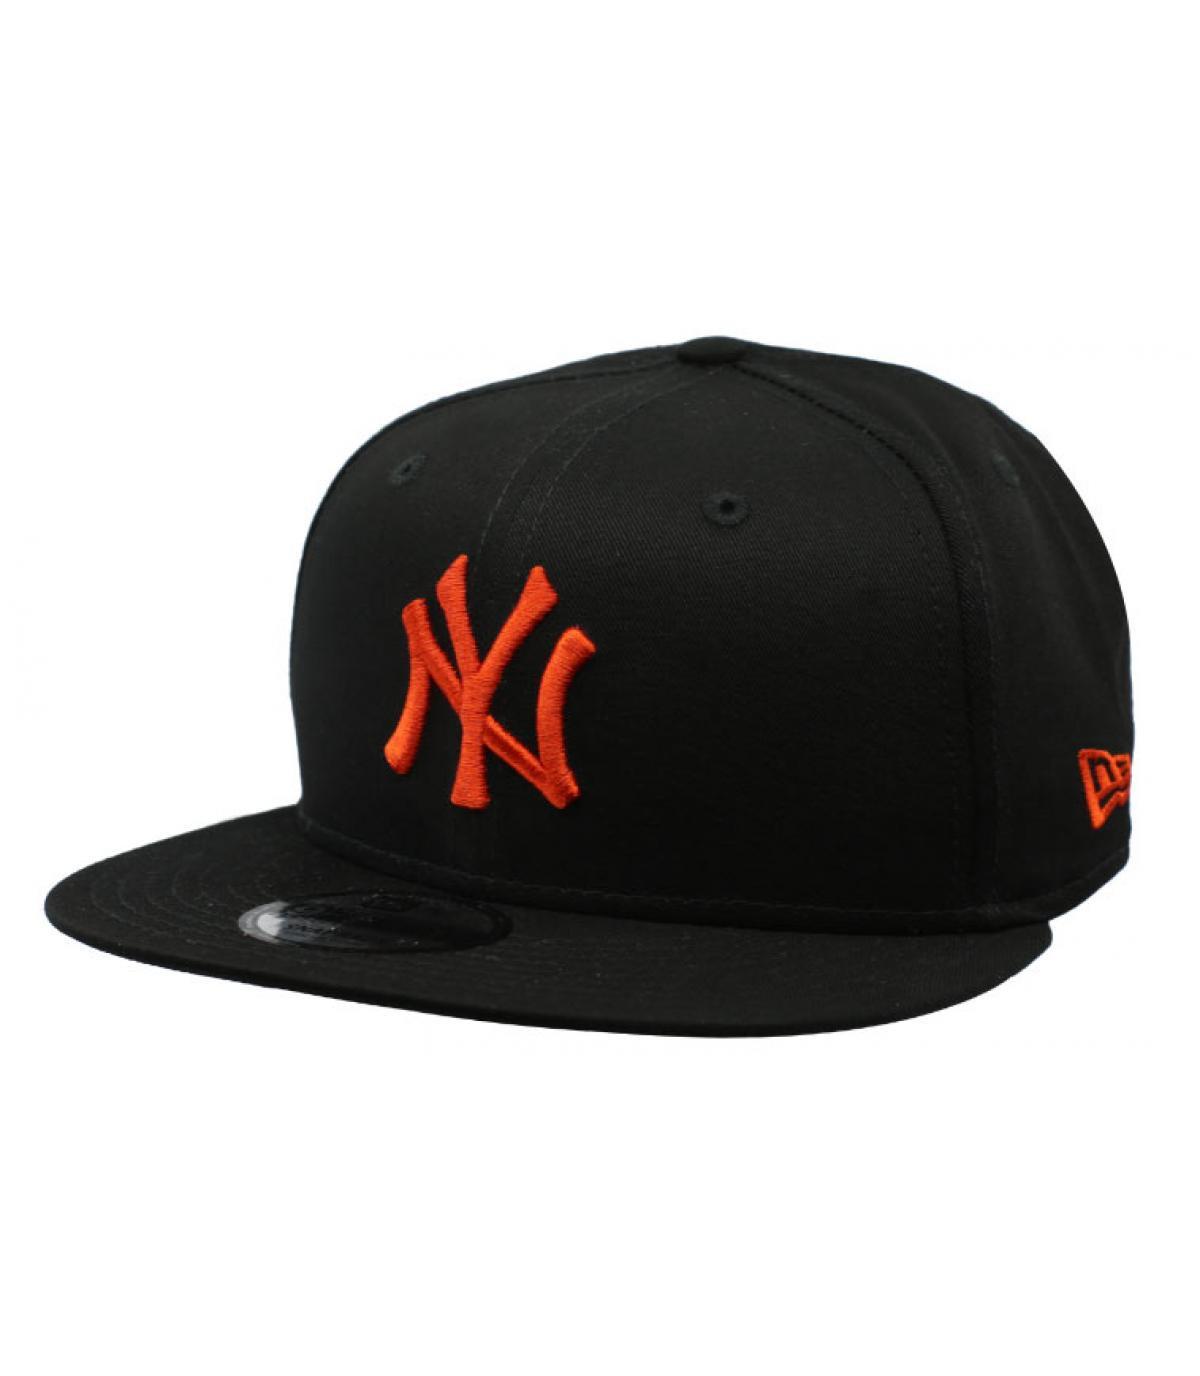 ba879e552cce ... Details Snapback Kids League Ess NY 9Fifty black orange - Abbildung 2  ...